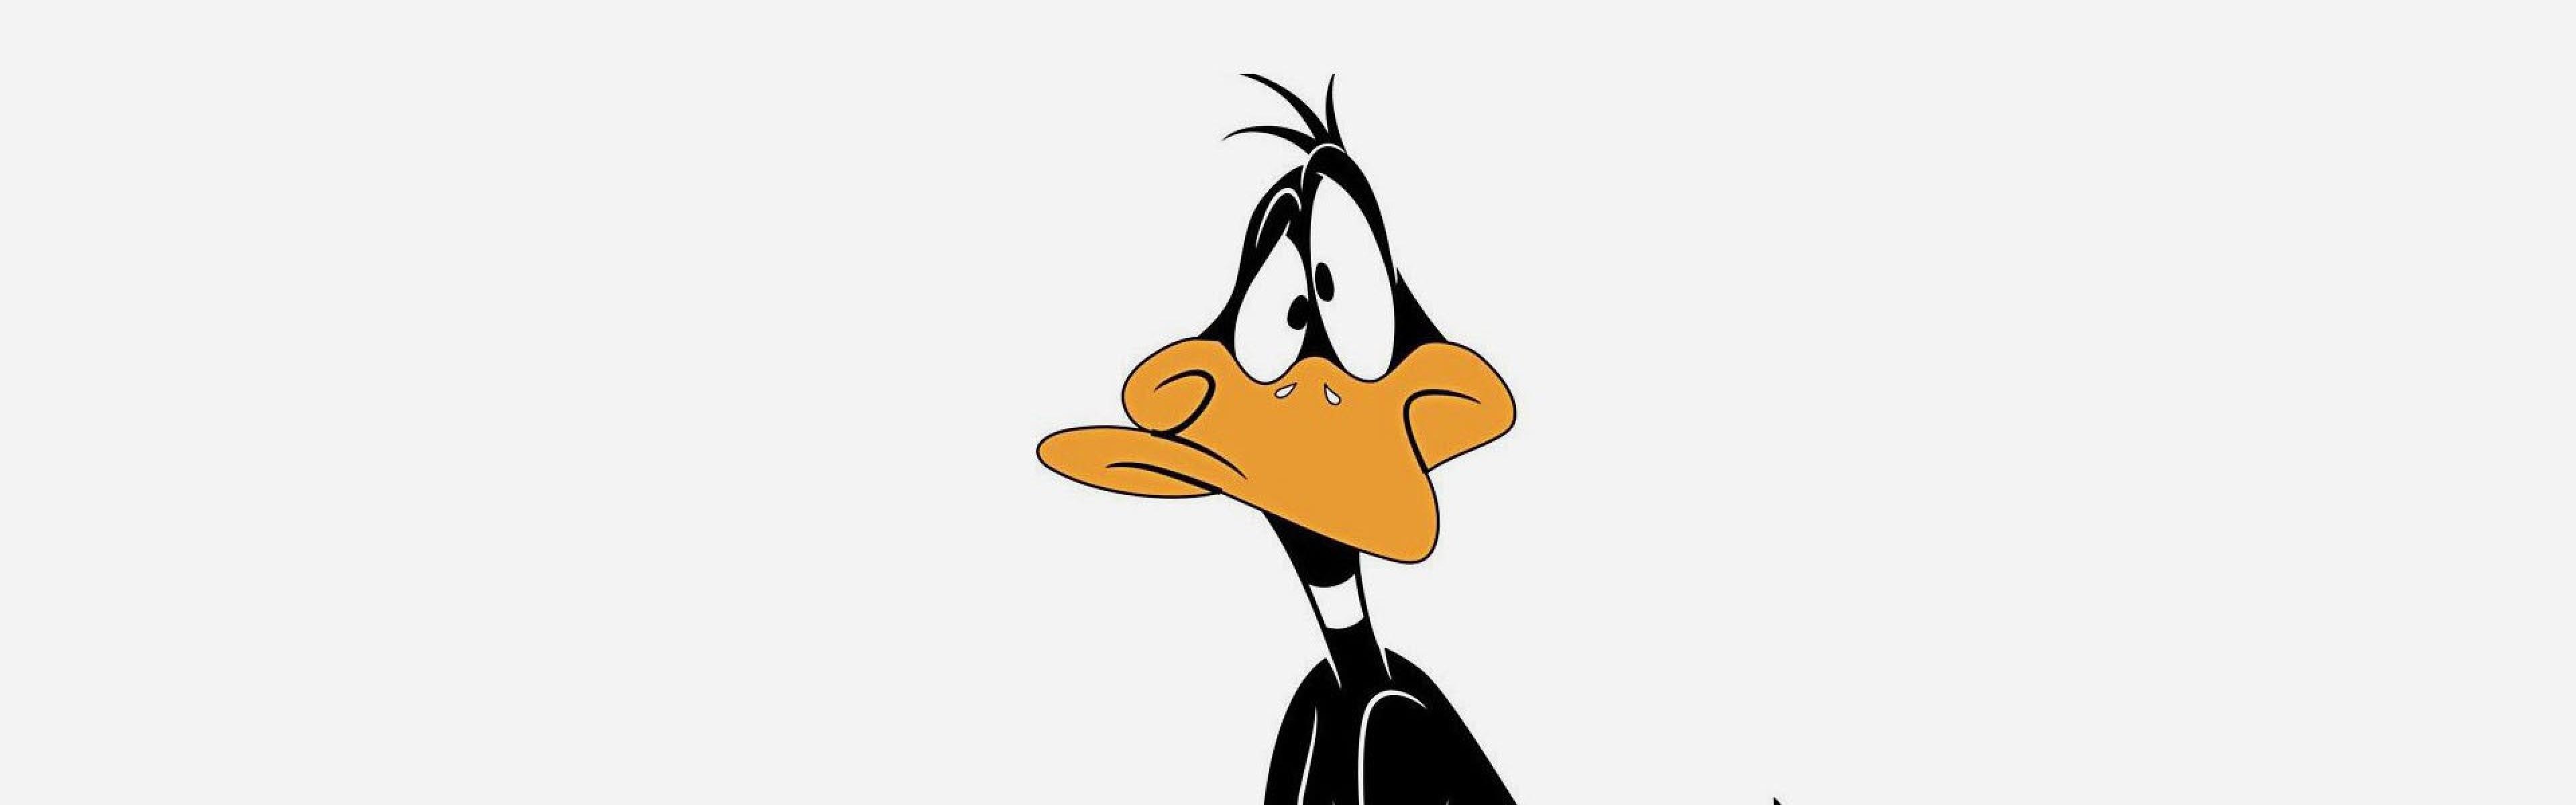 Daffy Duck Cartoon Art